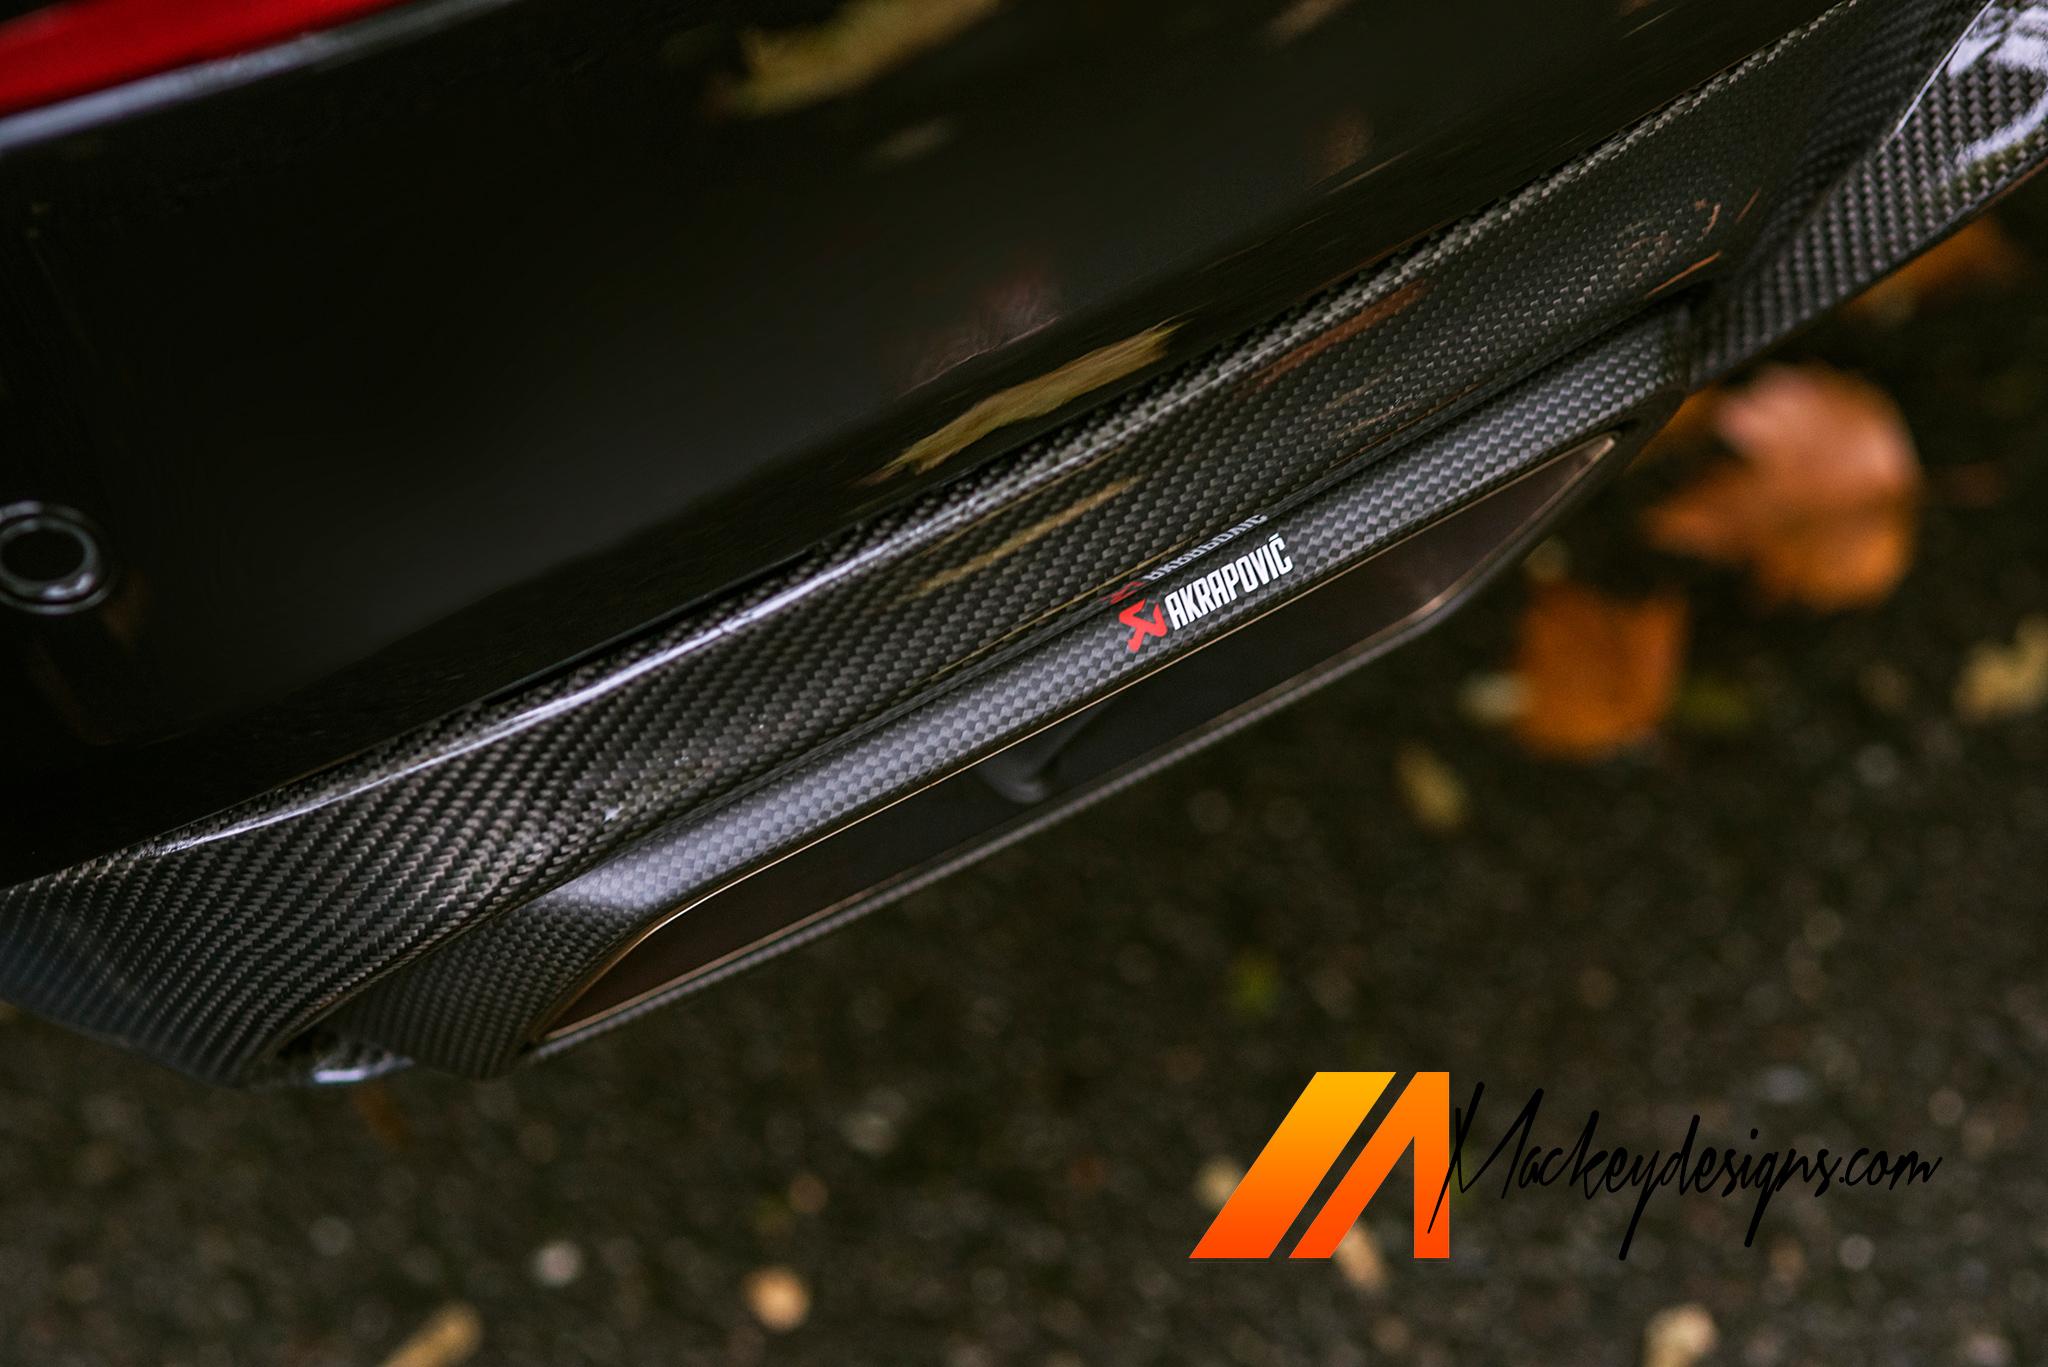 Mackeydesigns_Mercedes_C63S-5.jpg